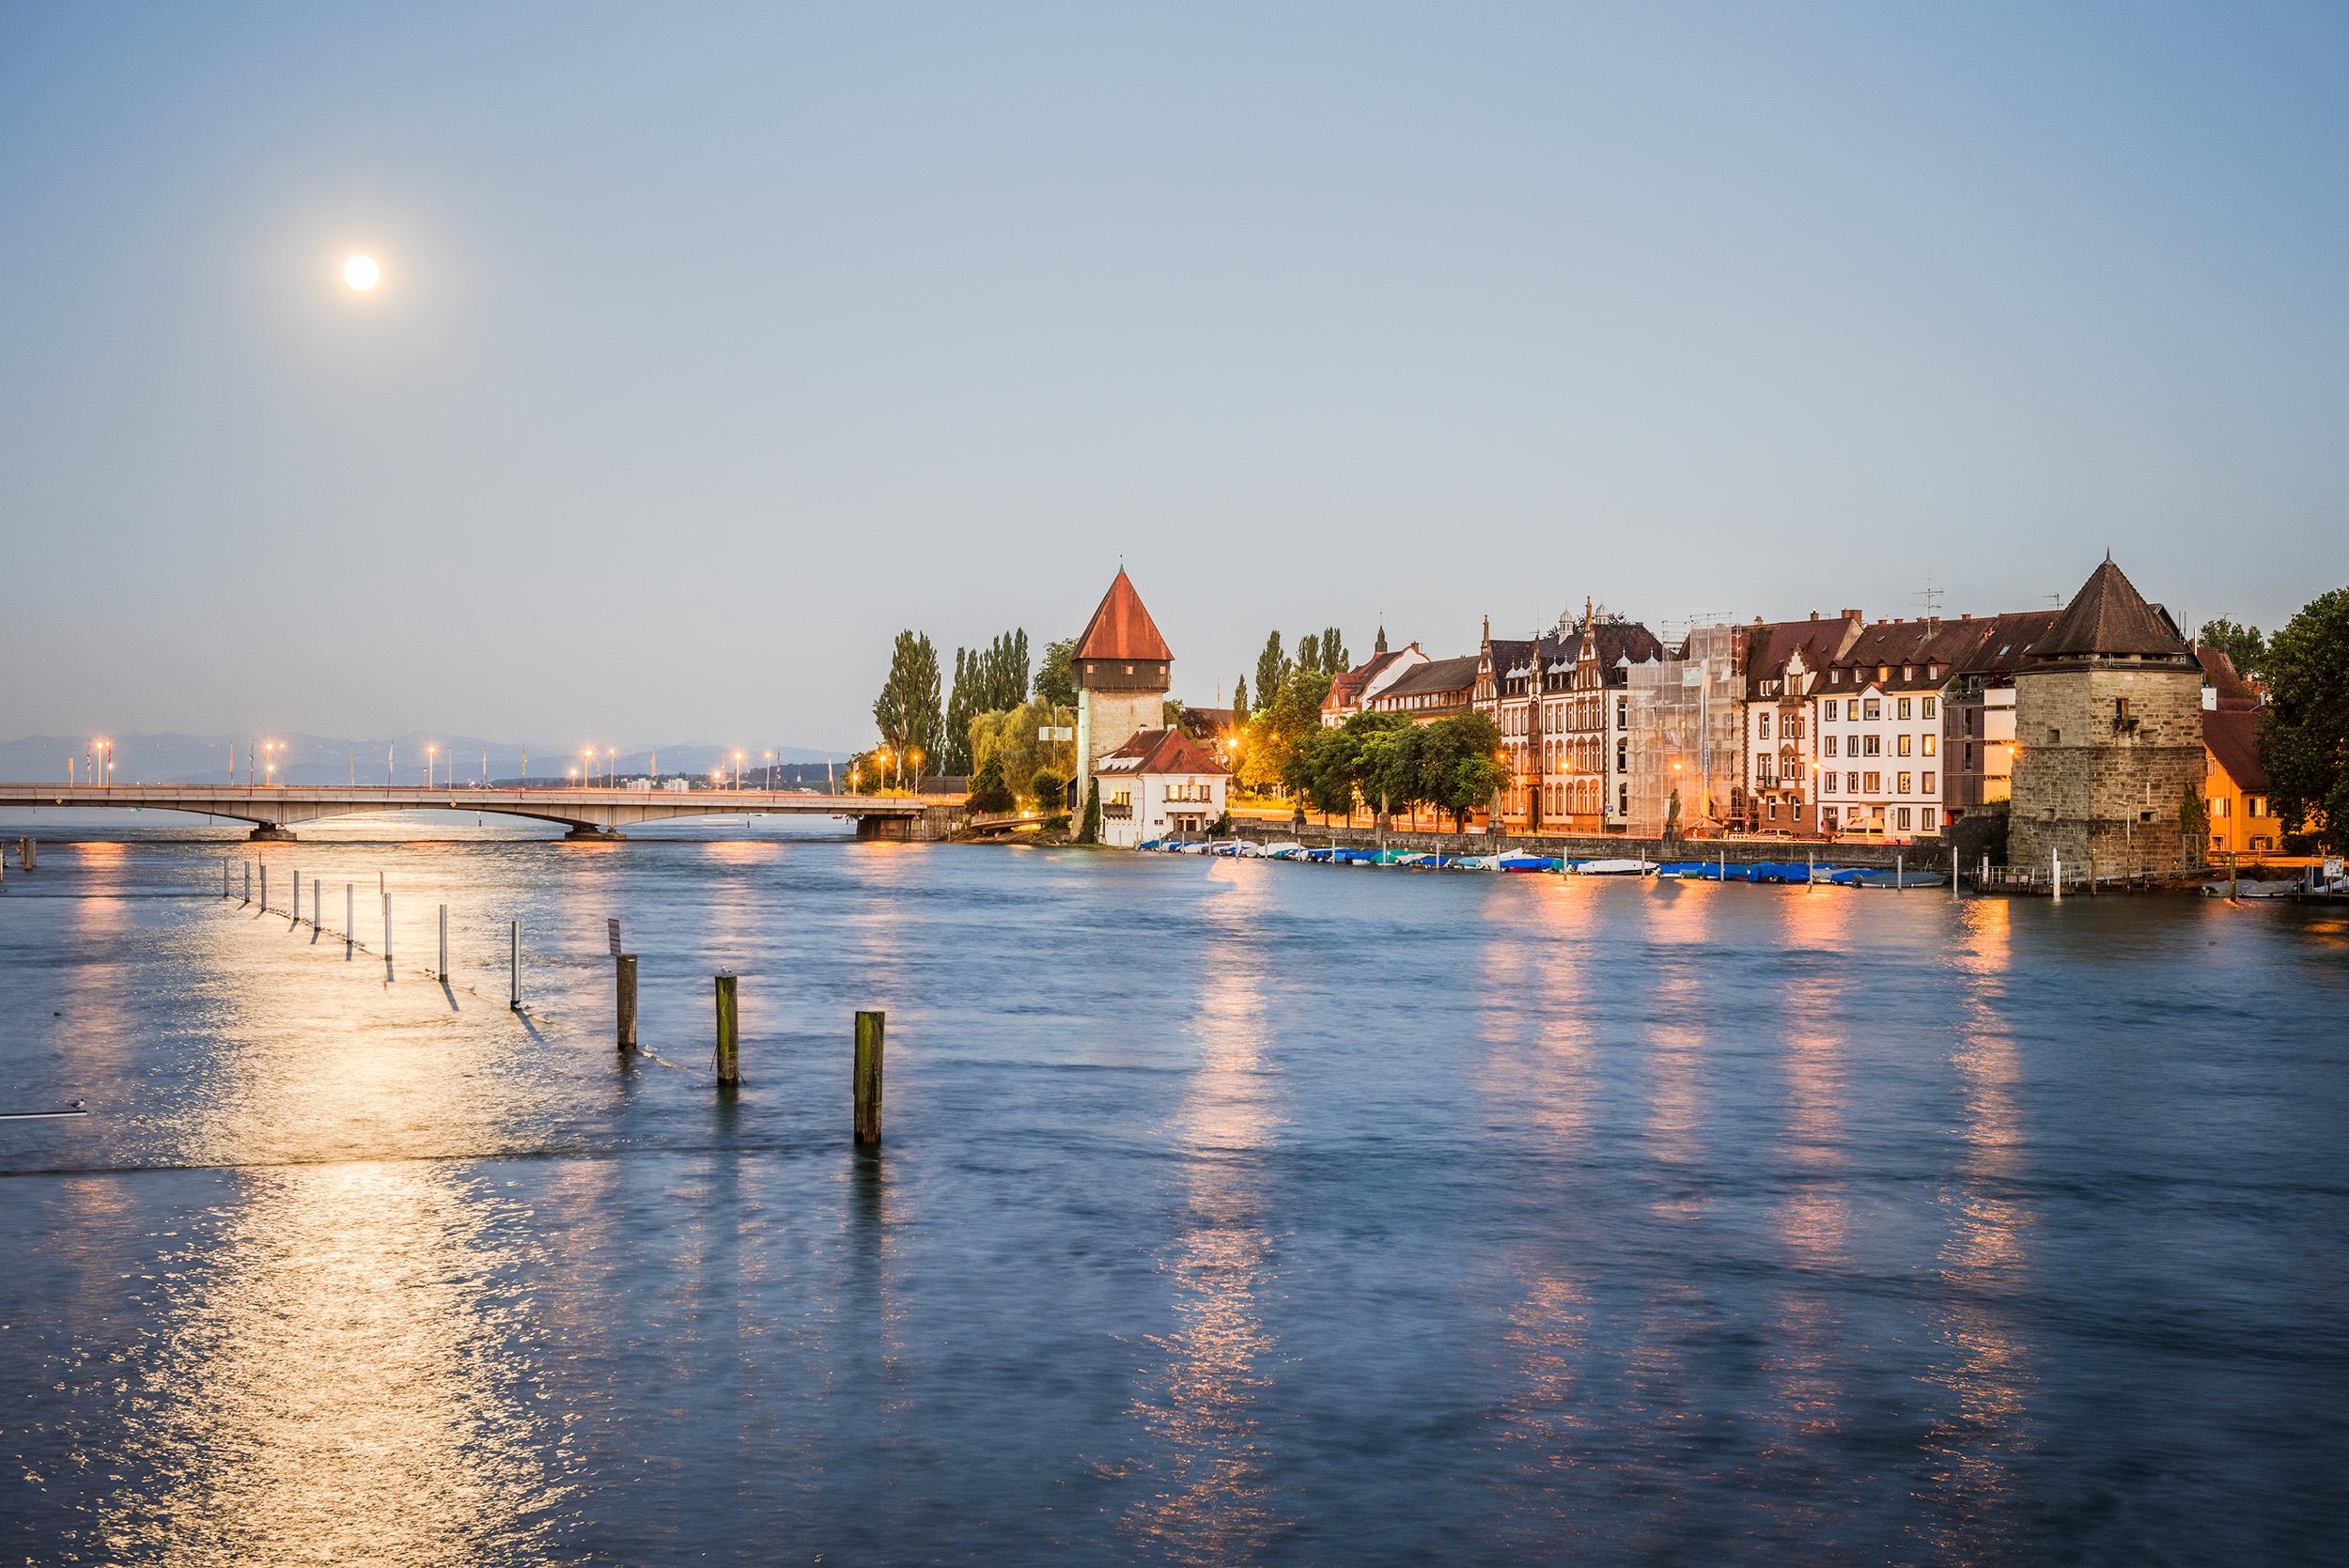 Sterne Hotel Bodensee